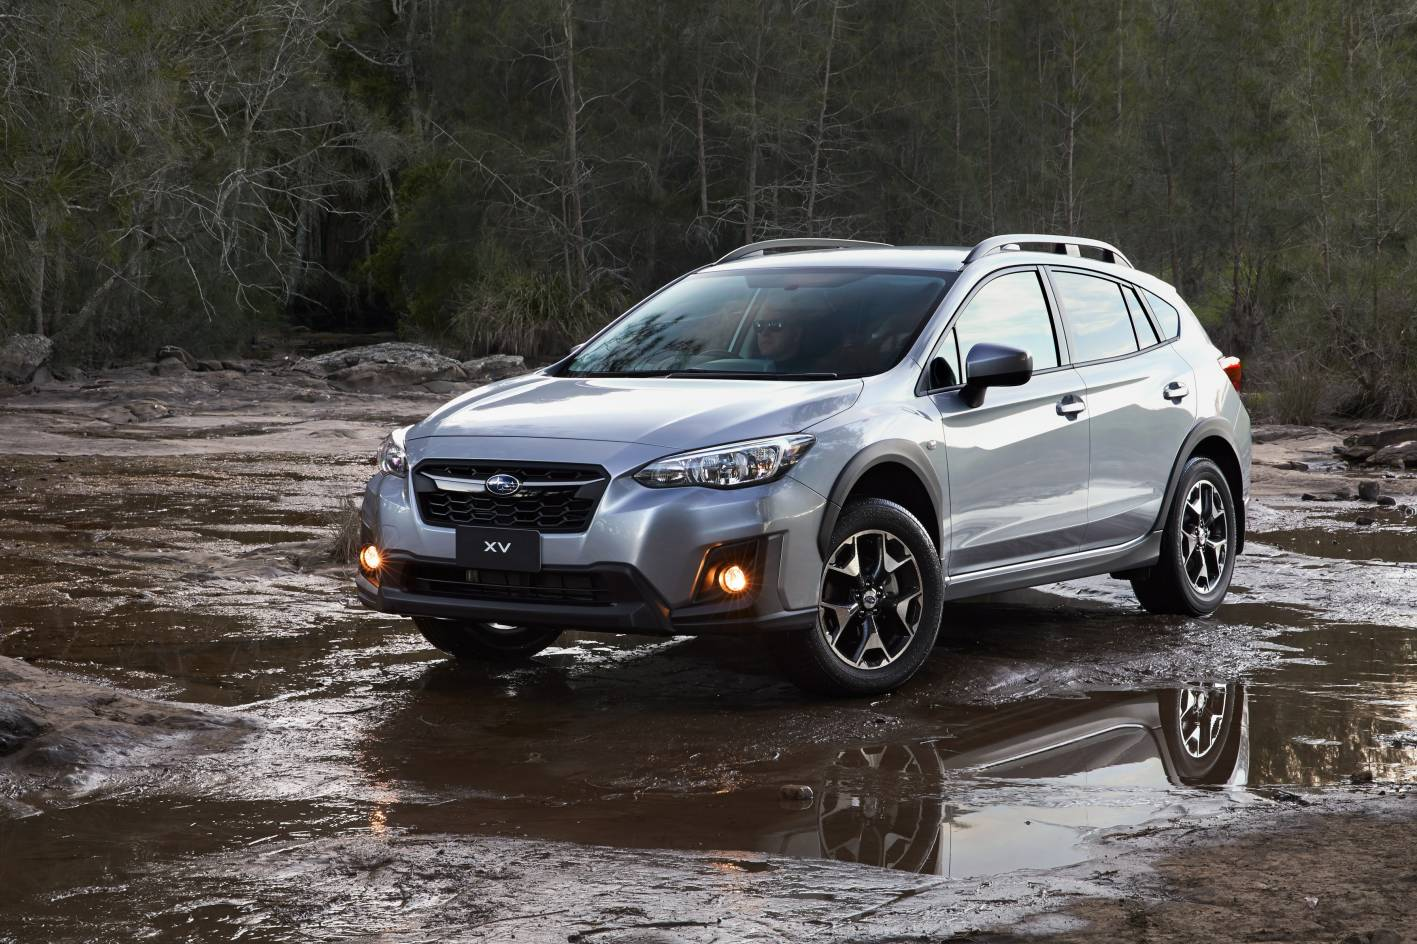 XV, like all Subarus (except the BRZ sports car), has Symmetrical AWD